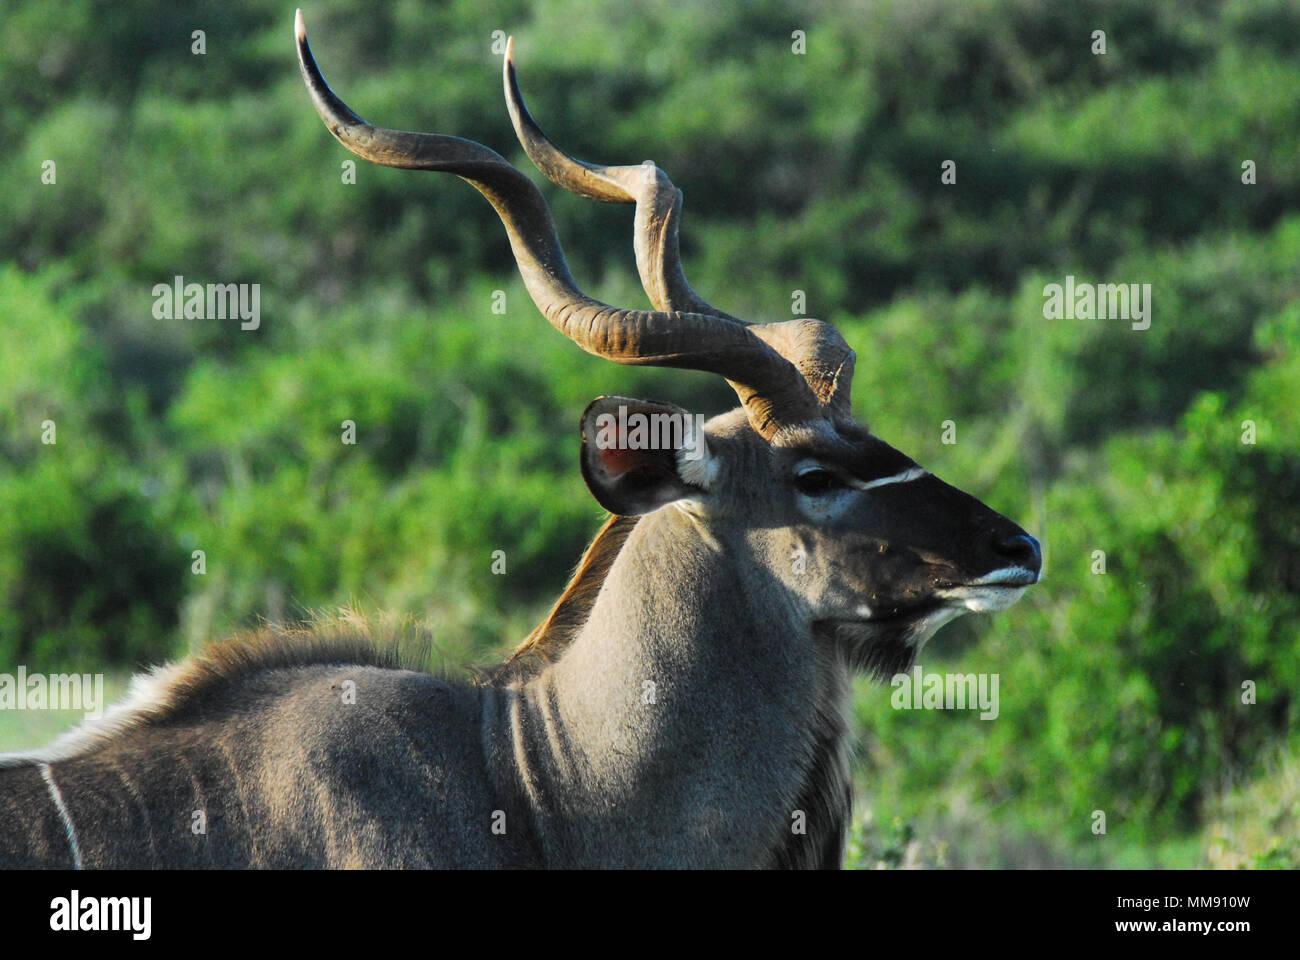 A beautiful wild Kudu Antelope encountered on safari in South Africa - Stock Image